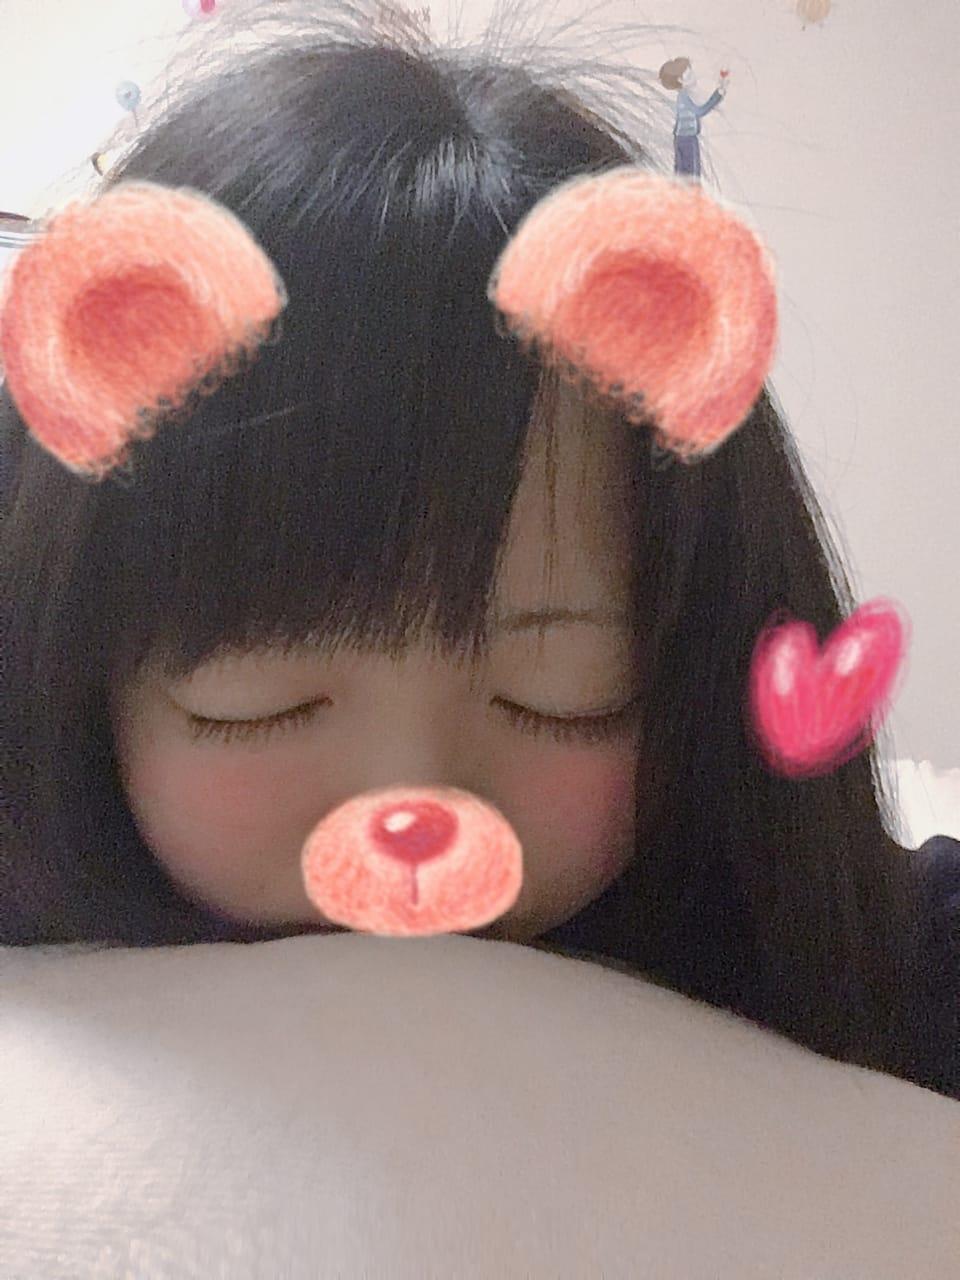 「cн? ?」04/28(04/28) 02:03 | 愛沢 妃奈の写メ・風俗動画